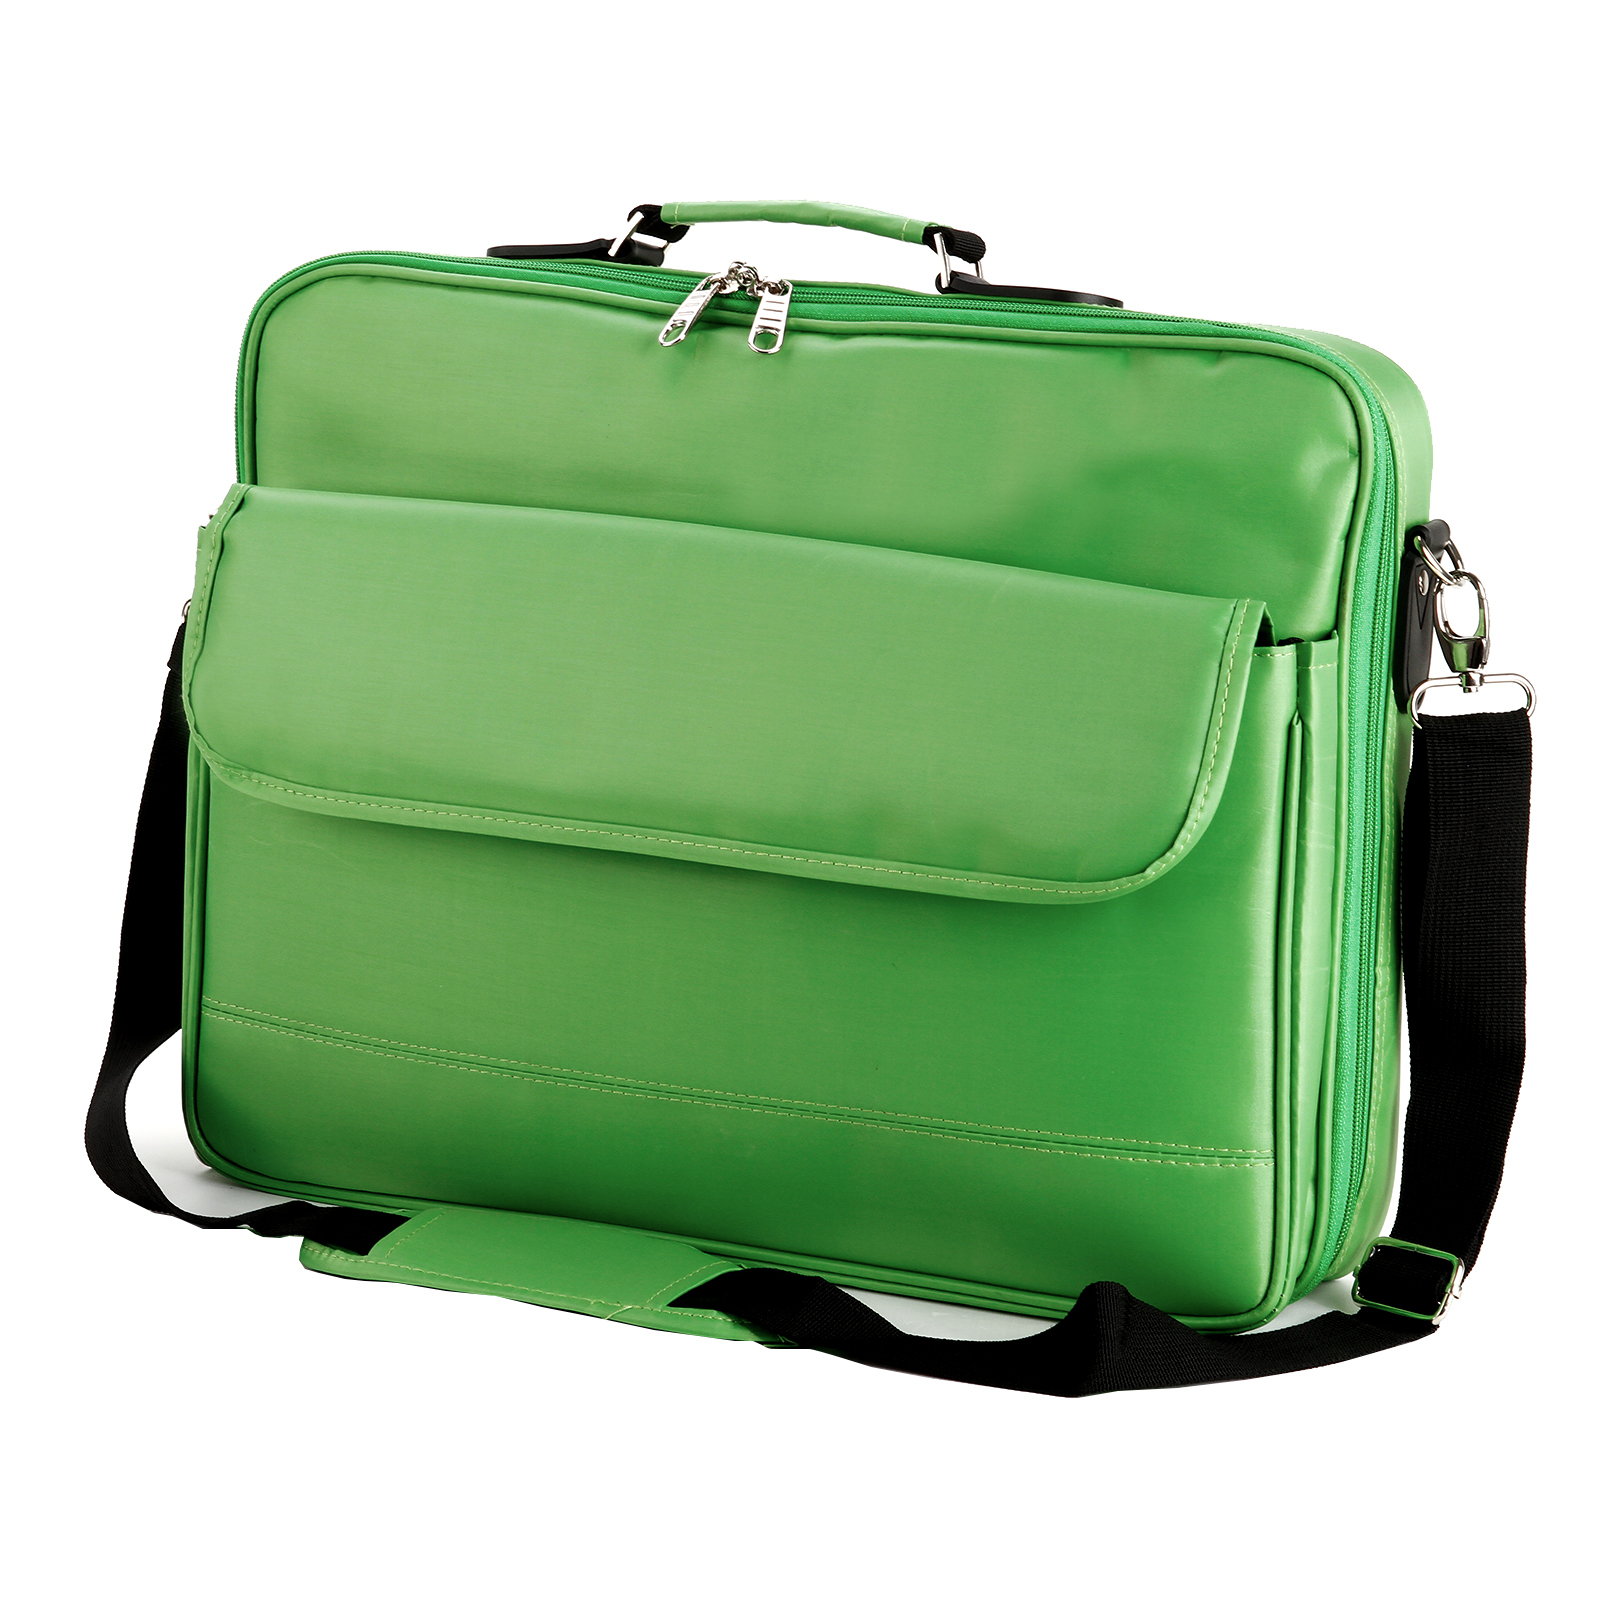 Treu Premium Notebook Tasche Echtes Leder Made In Italy Laptop Tasche Aktentasche Waren Jeder Beschreibung Sind VerfüGbar Koffer, Taschen & Accessoires